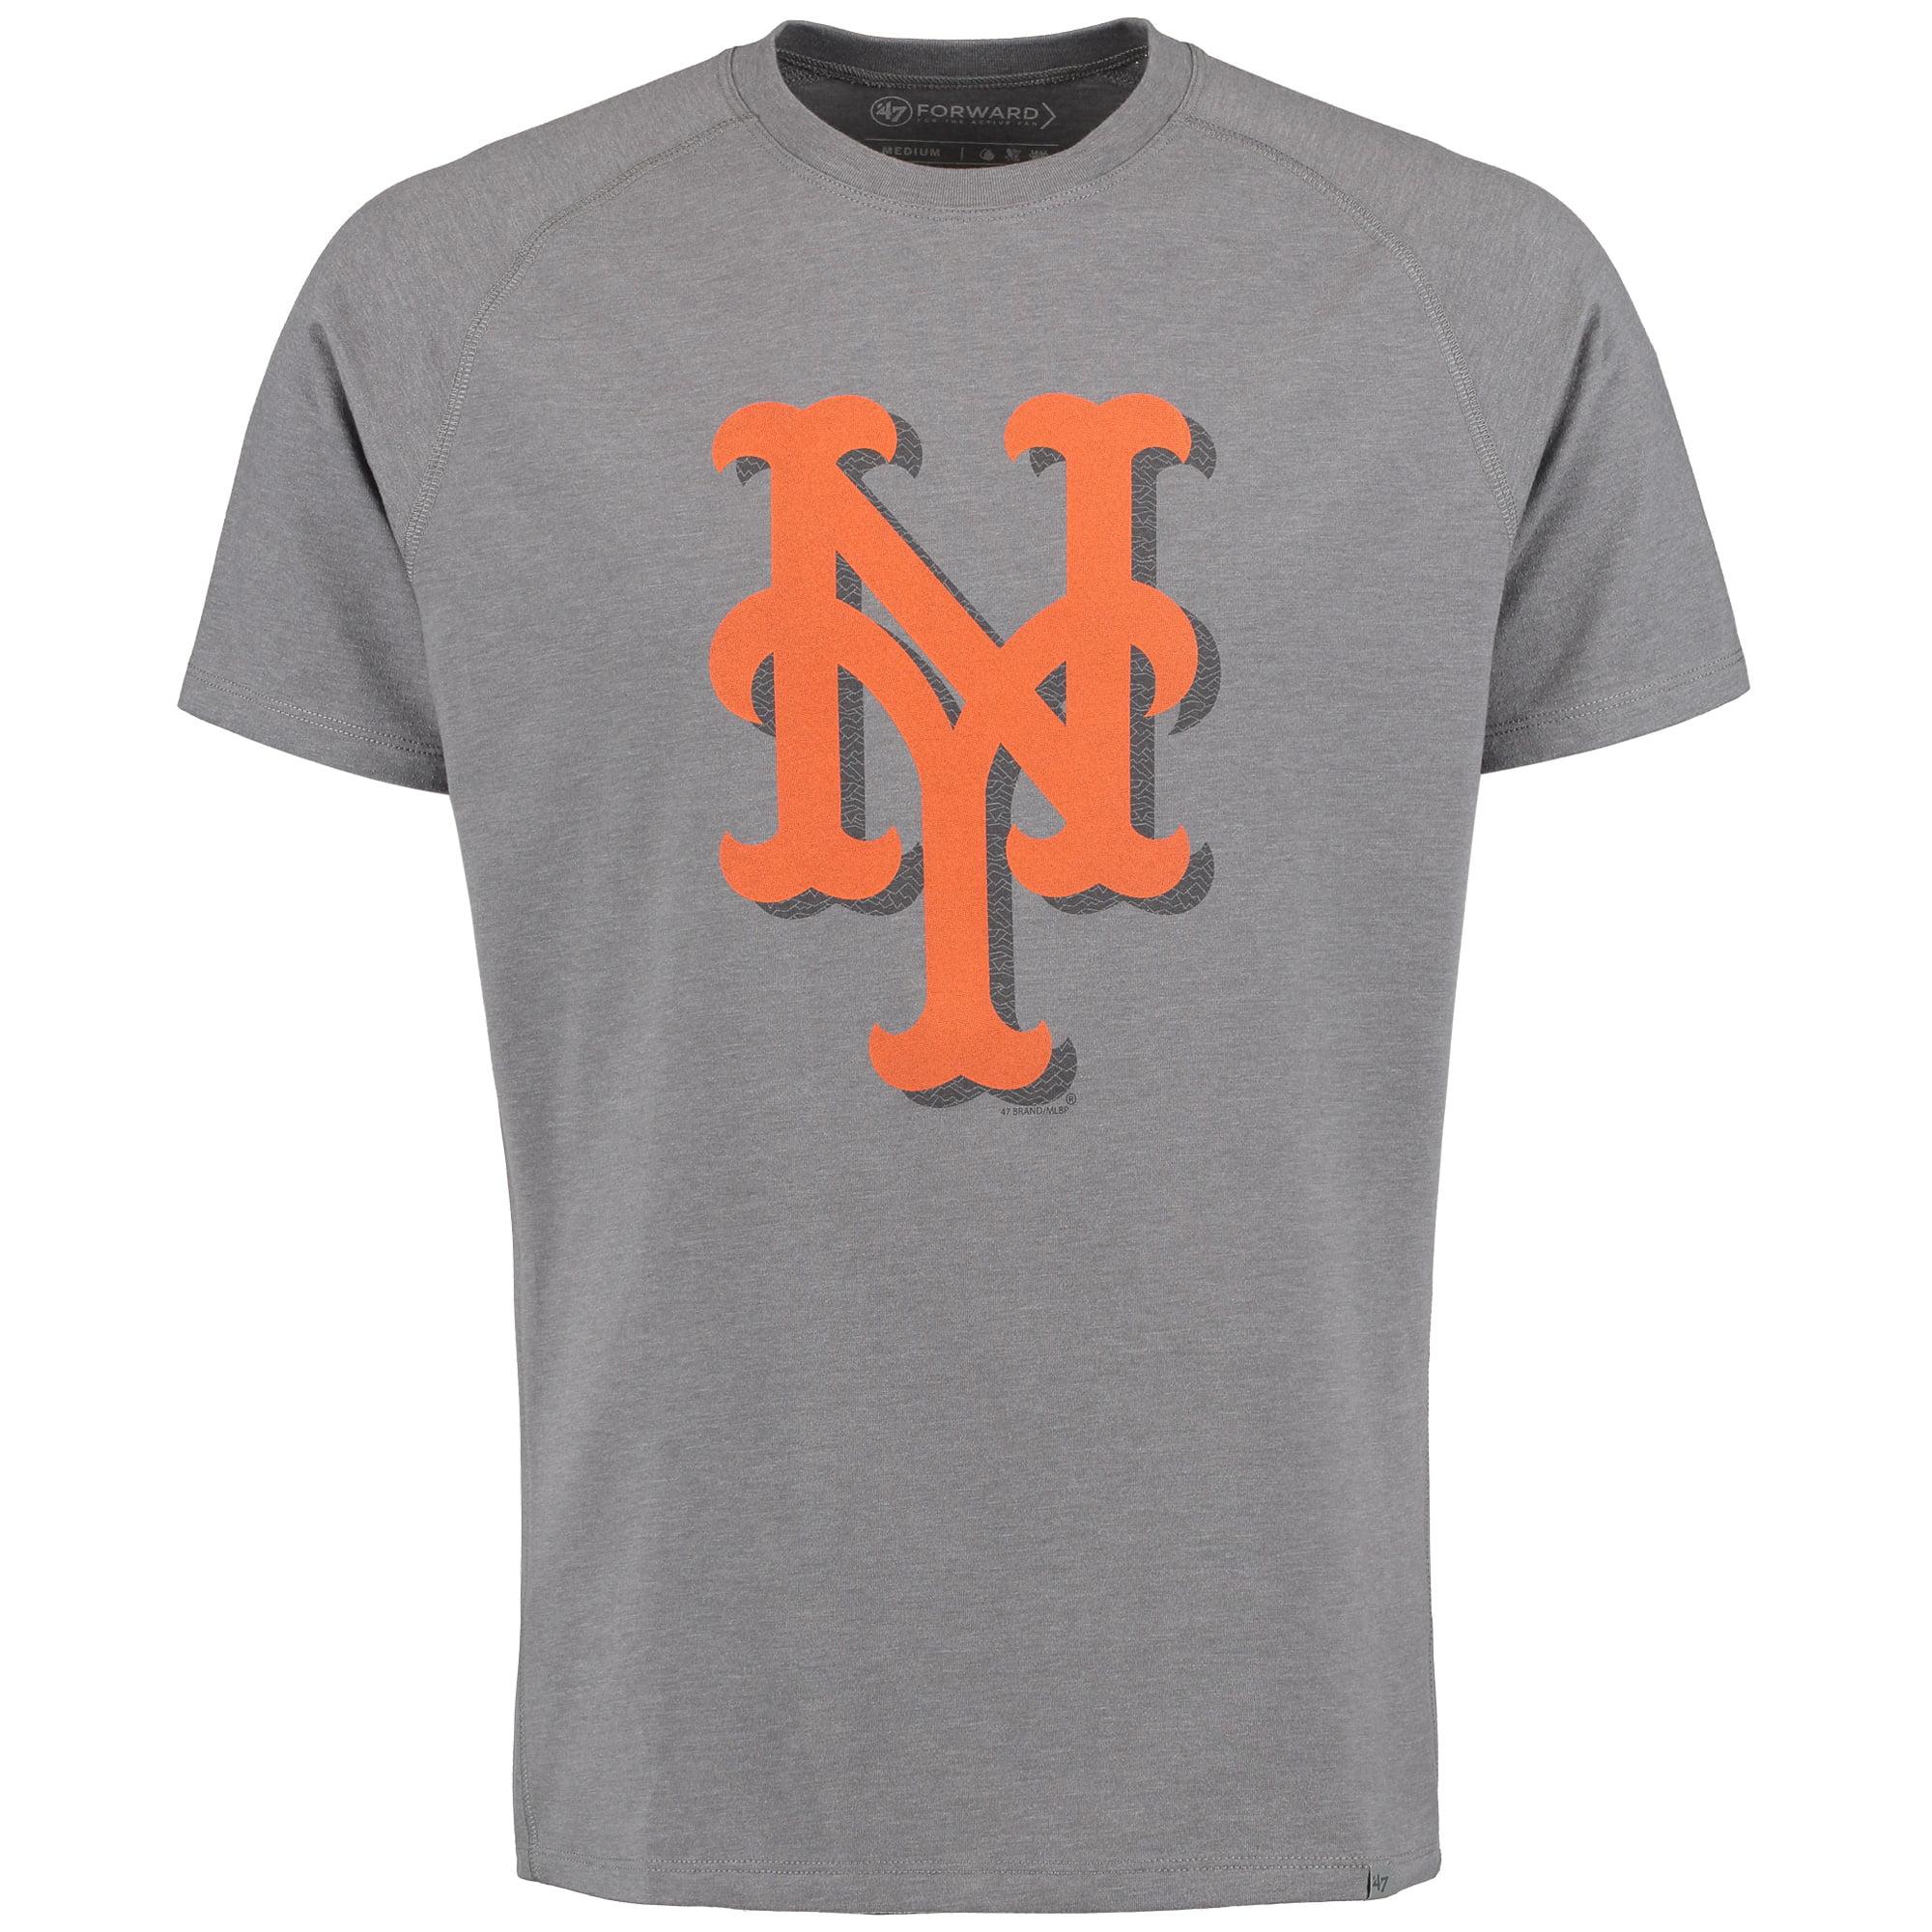 New York Mets '47 Forward Speed Up T-Shirt - Gray